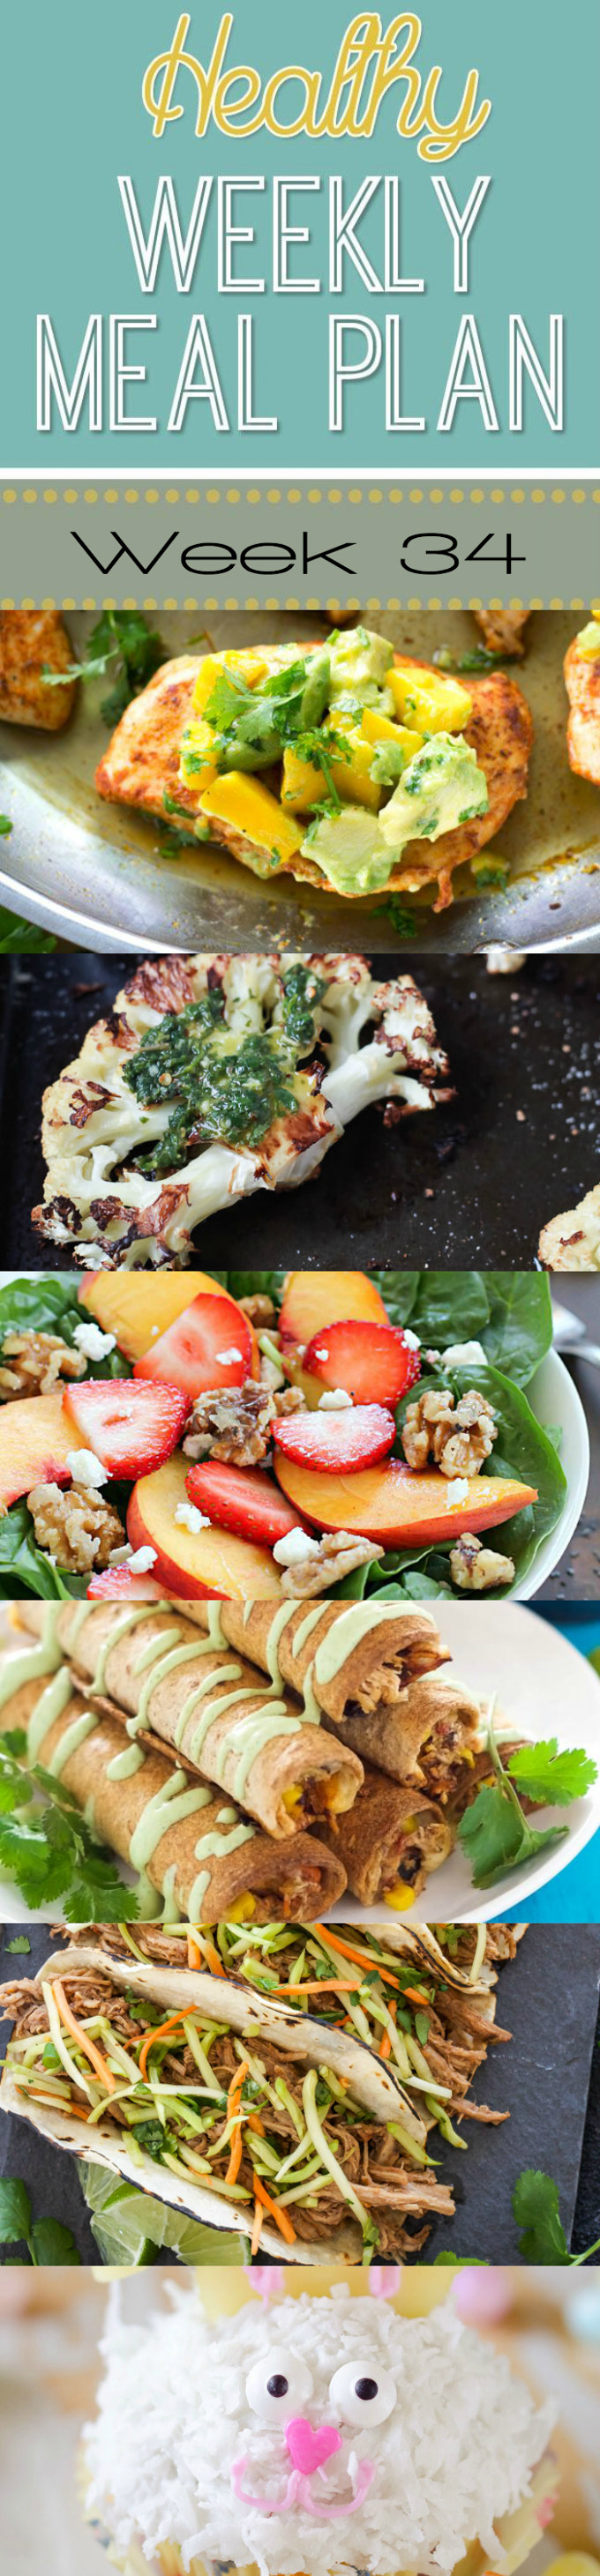 Healthy Weekly Meal Plan #34